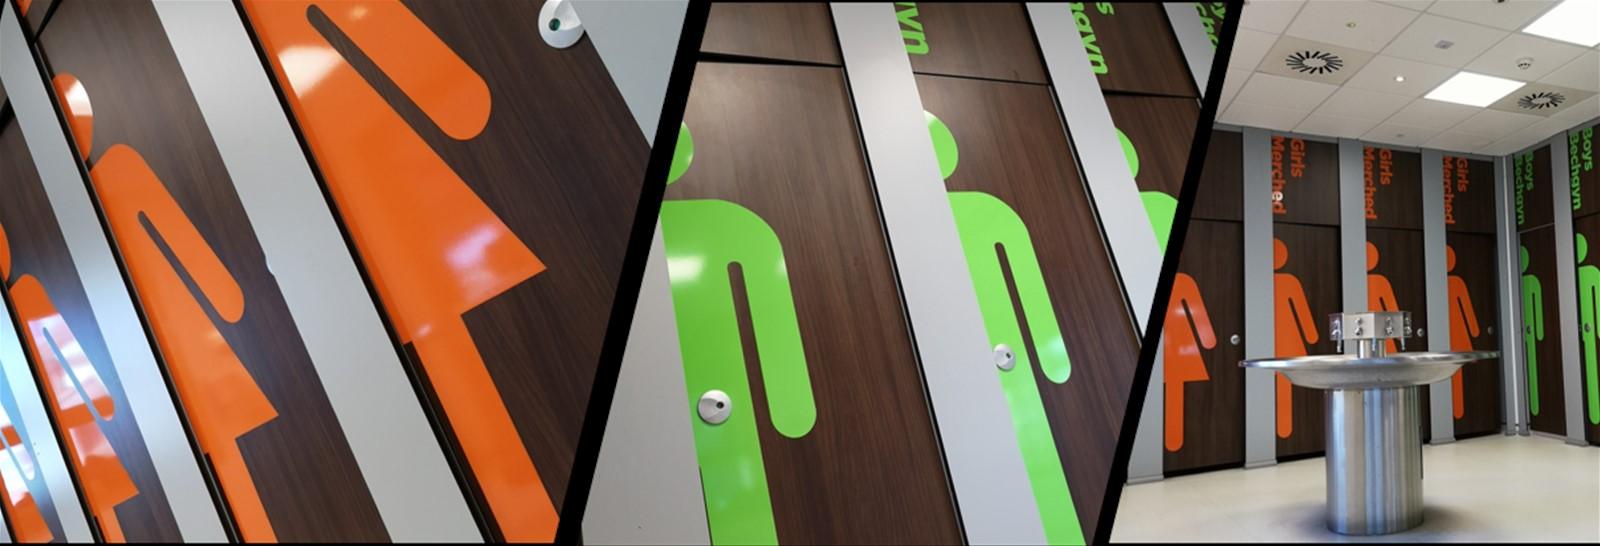 Vinyl applied to toilet cubicle doors